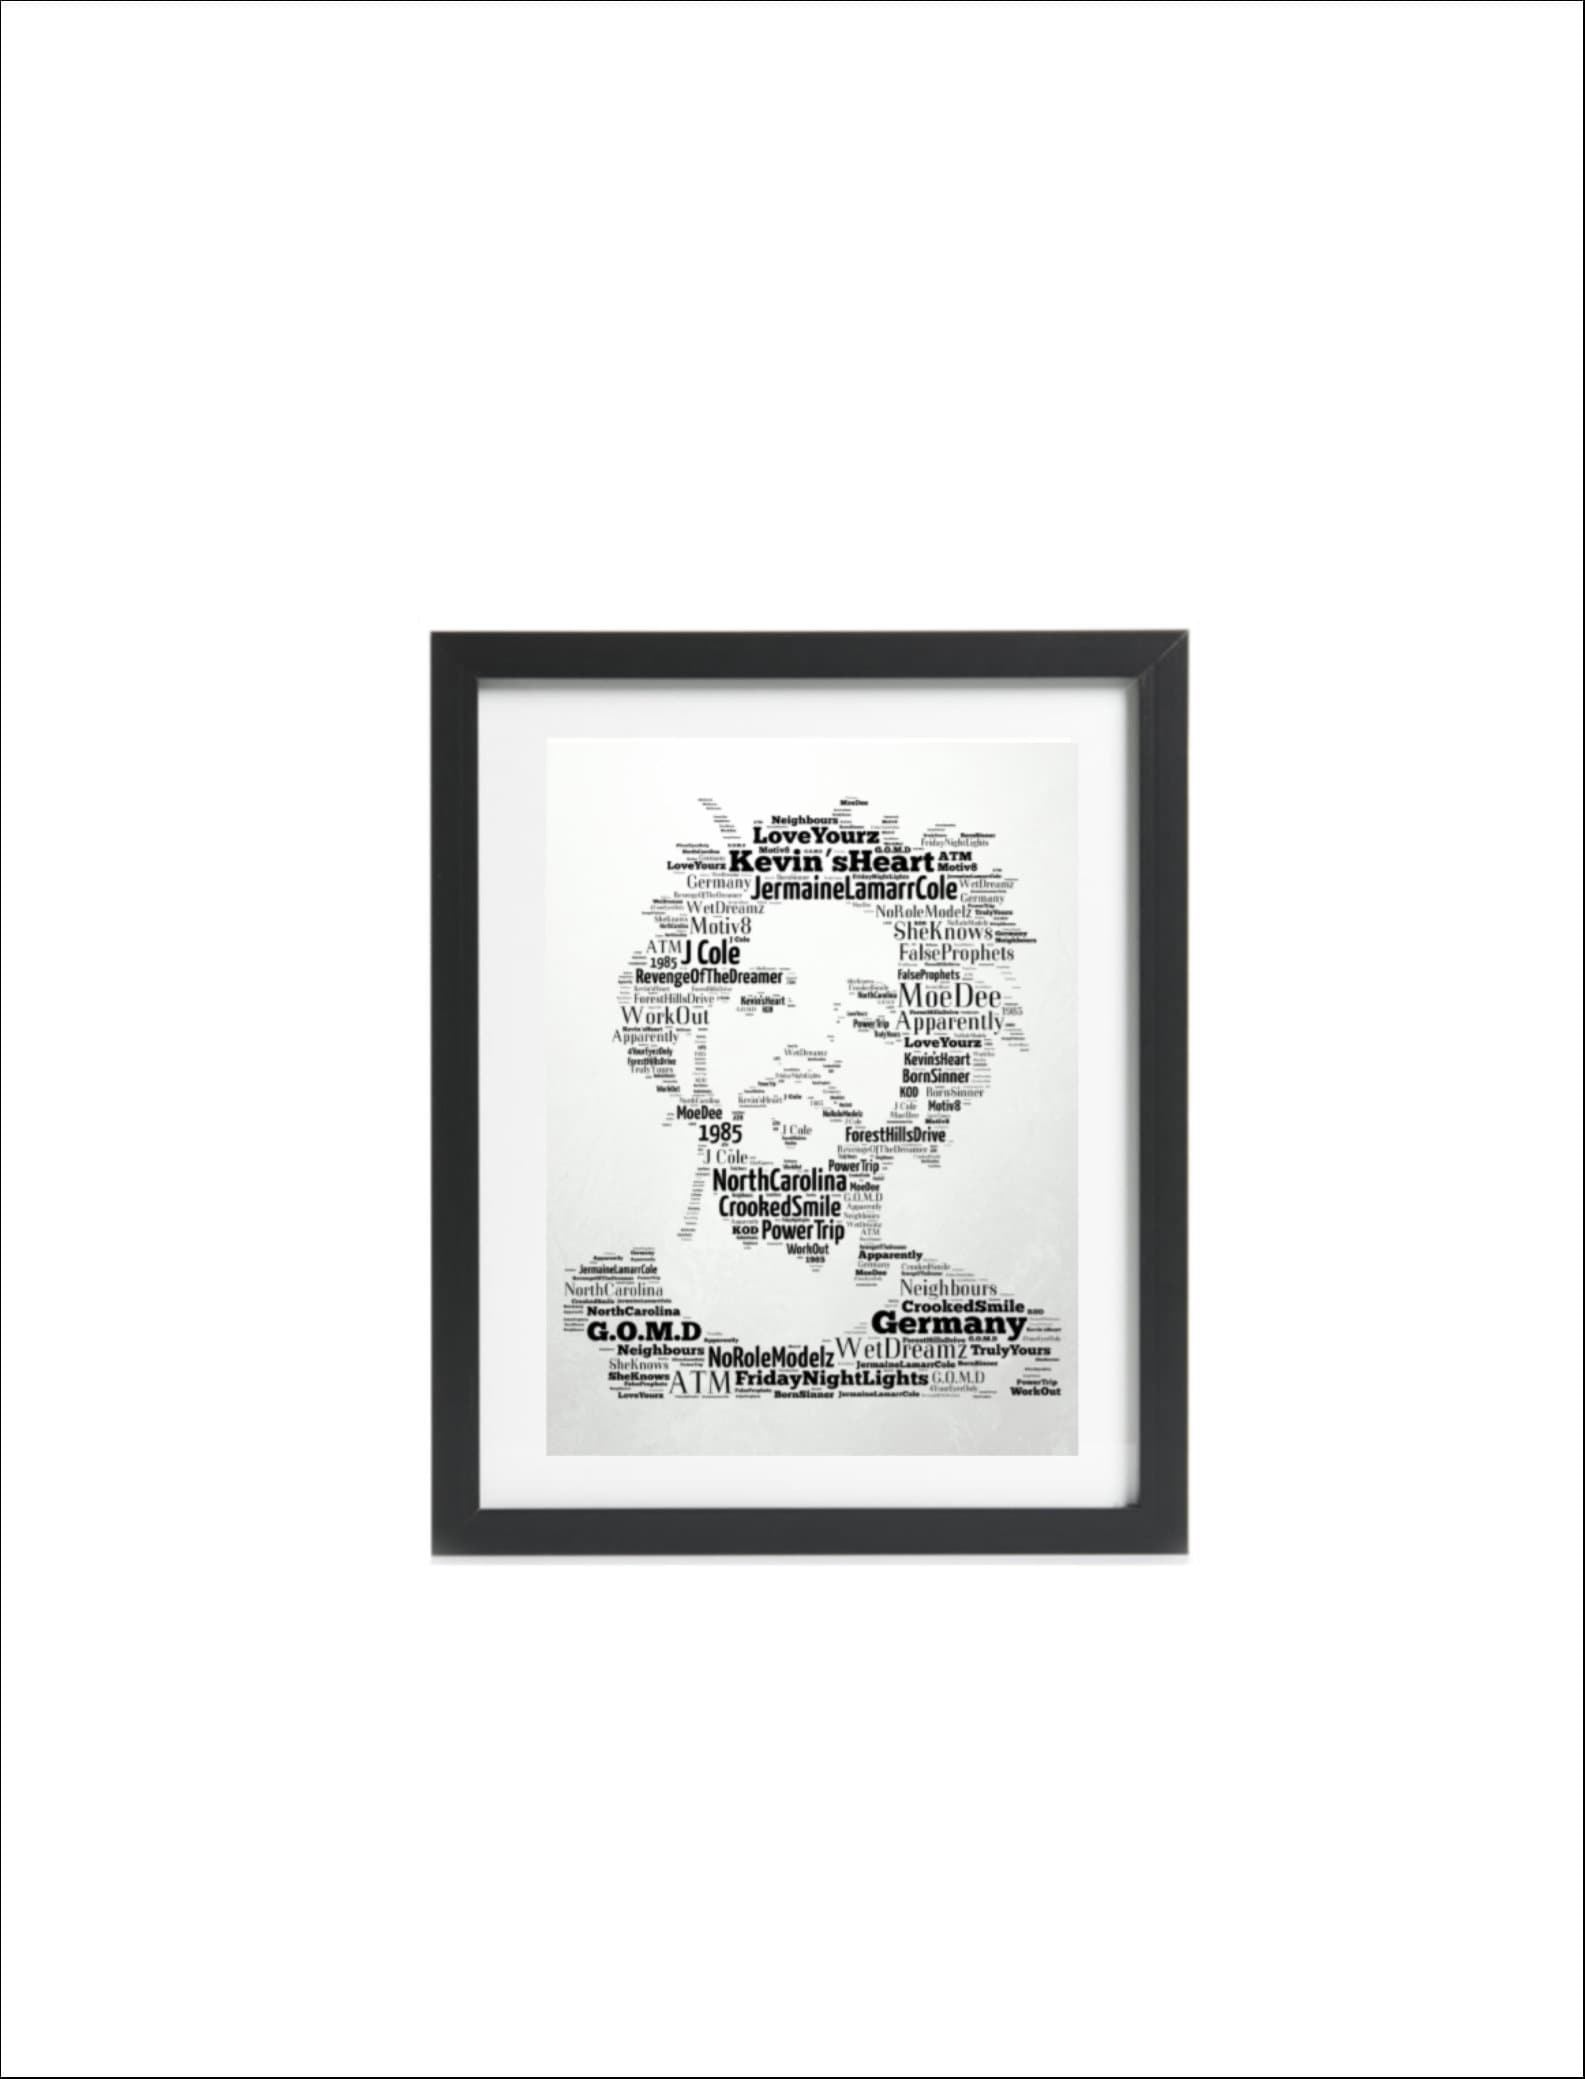 36d5c241b0c J Cole - Hip Hop - Music Icon/Legend Songs - Word Art Unique  Keepsake/Collectible/Memorabilia/Gift - FREE-POST UK - Fast dispatch